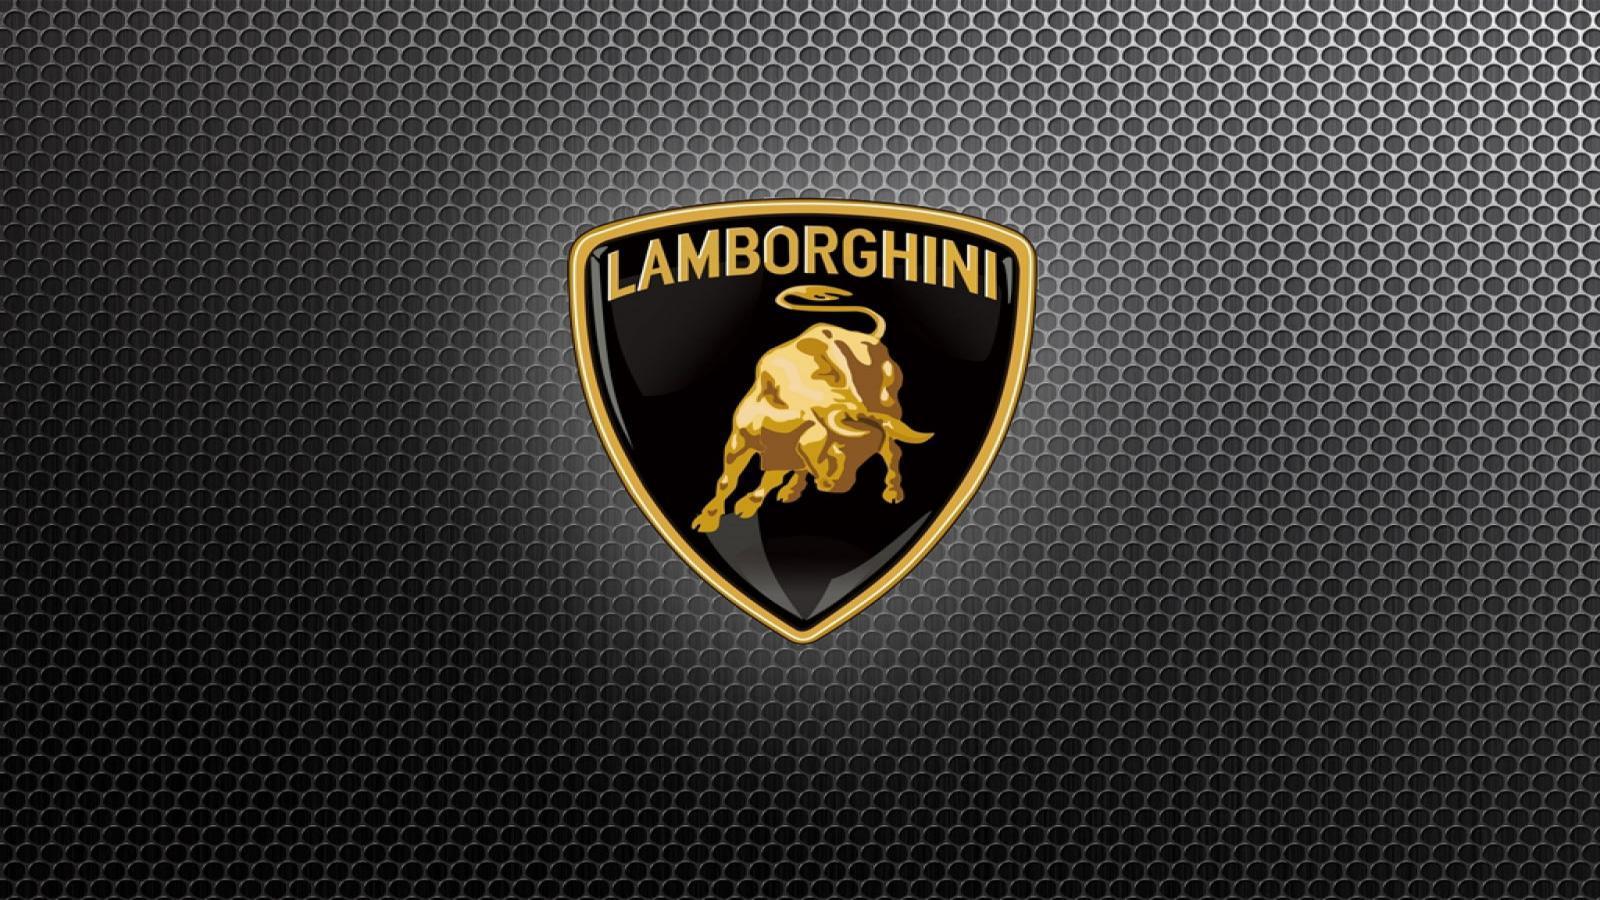 Lamborghini Logo 3d Wallpapers Wallpaper Cave